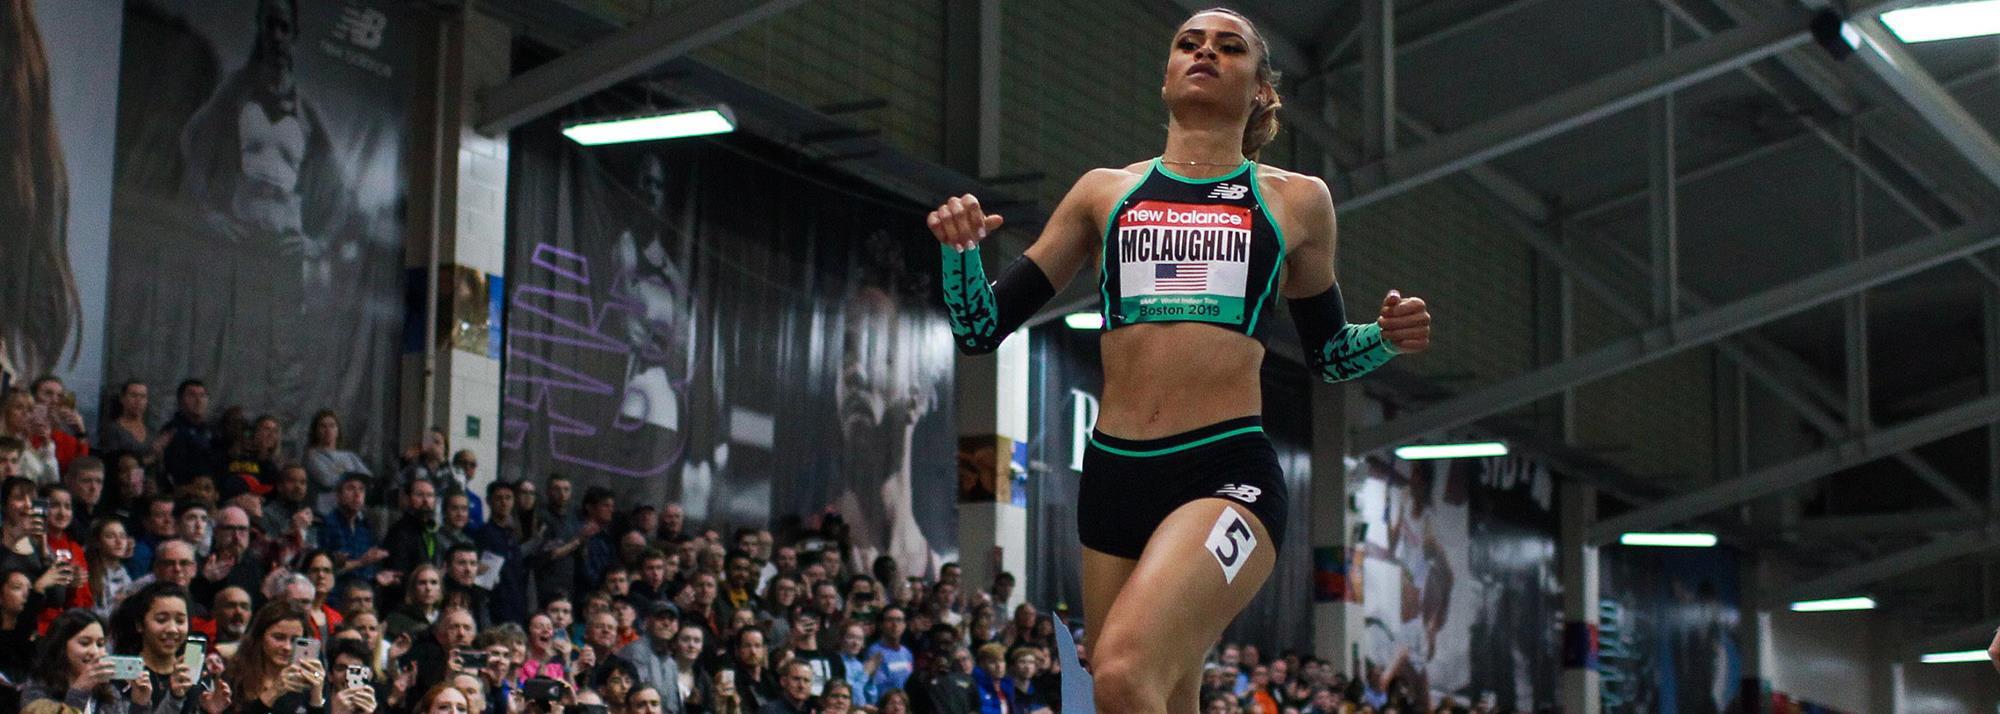 Spotlight on Ali, Brazier and McLaughlin as World Athletics Indoor Tour kicks off in Boston